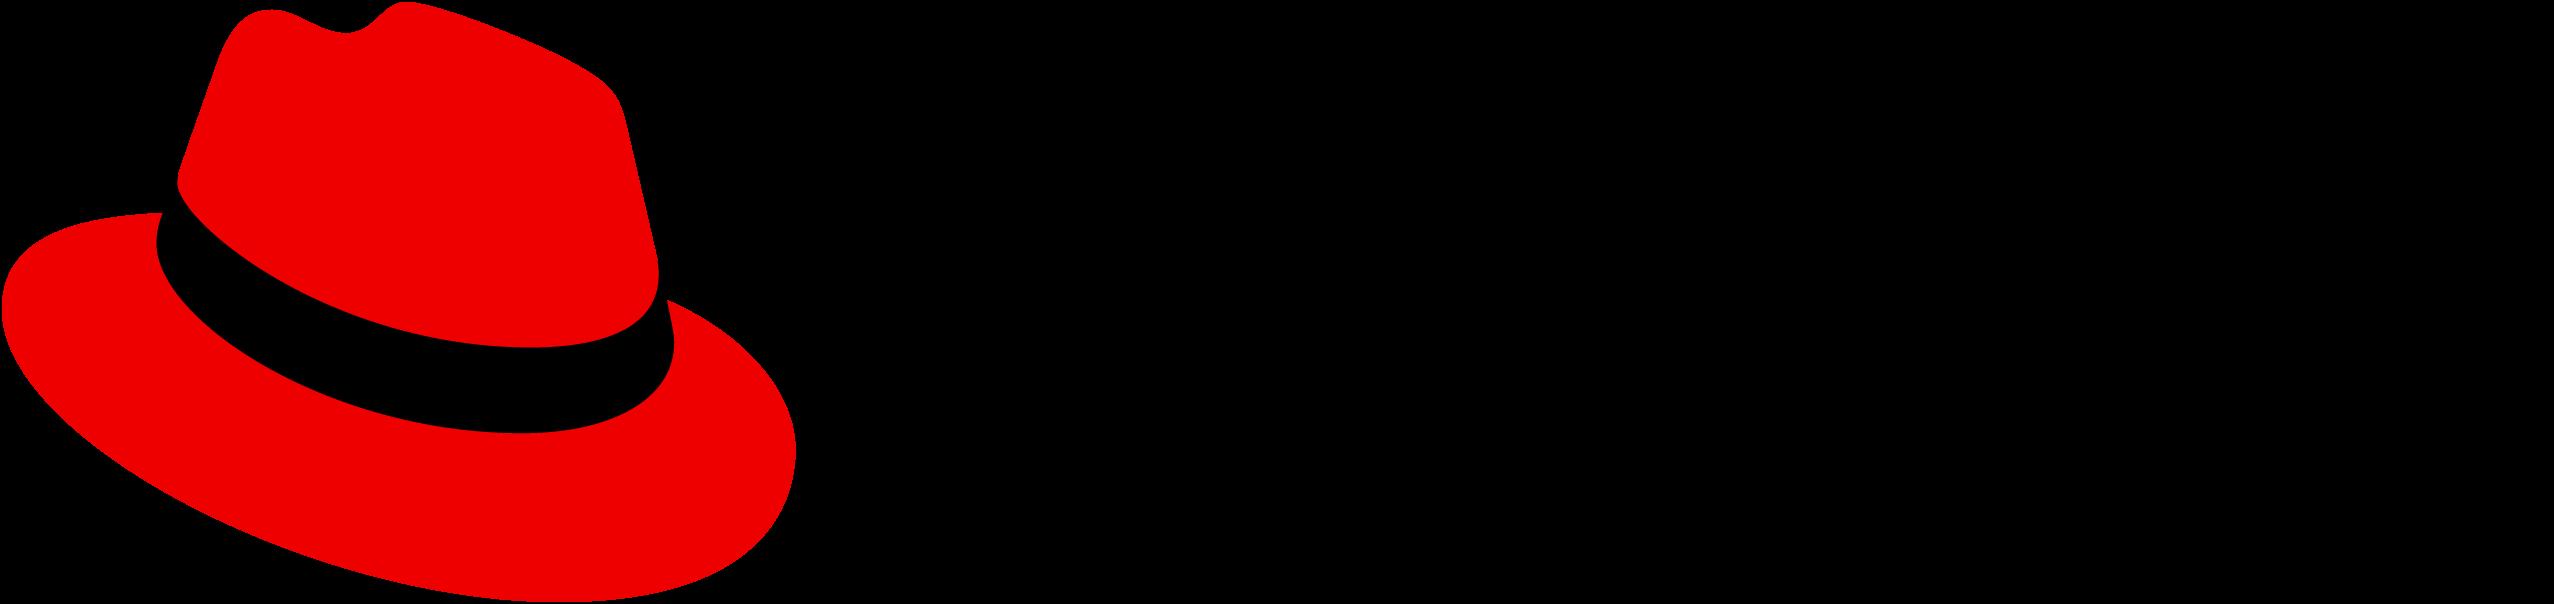 redhat-1